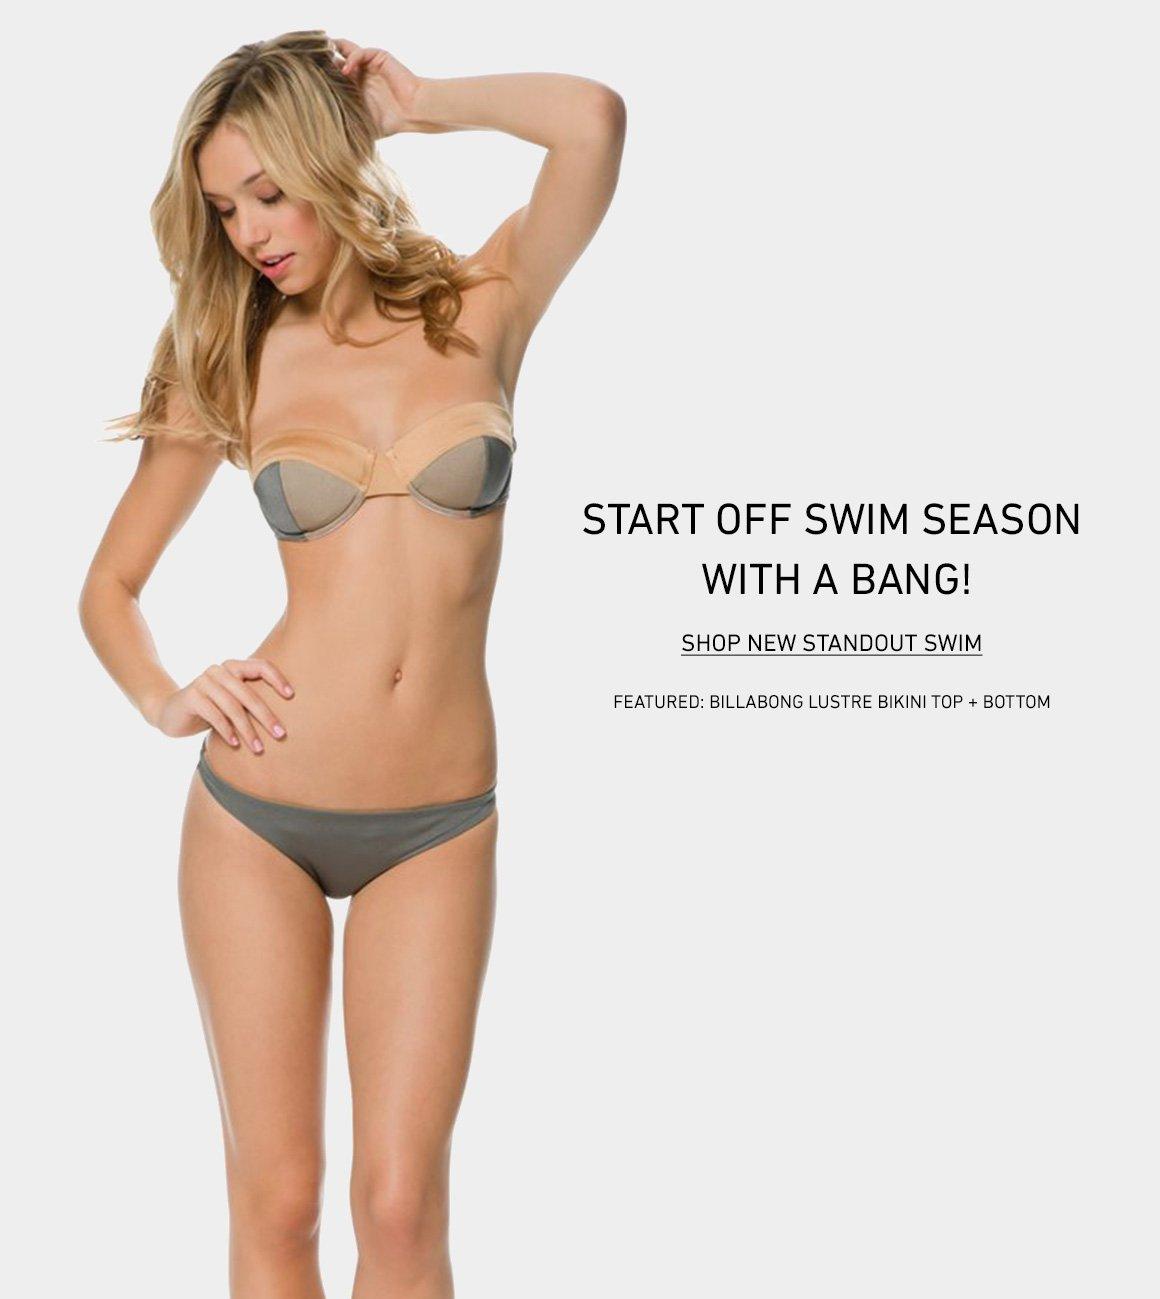 Shop New Standout Swim